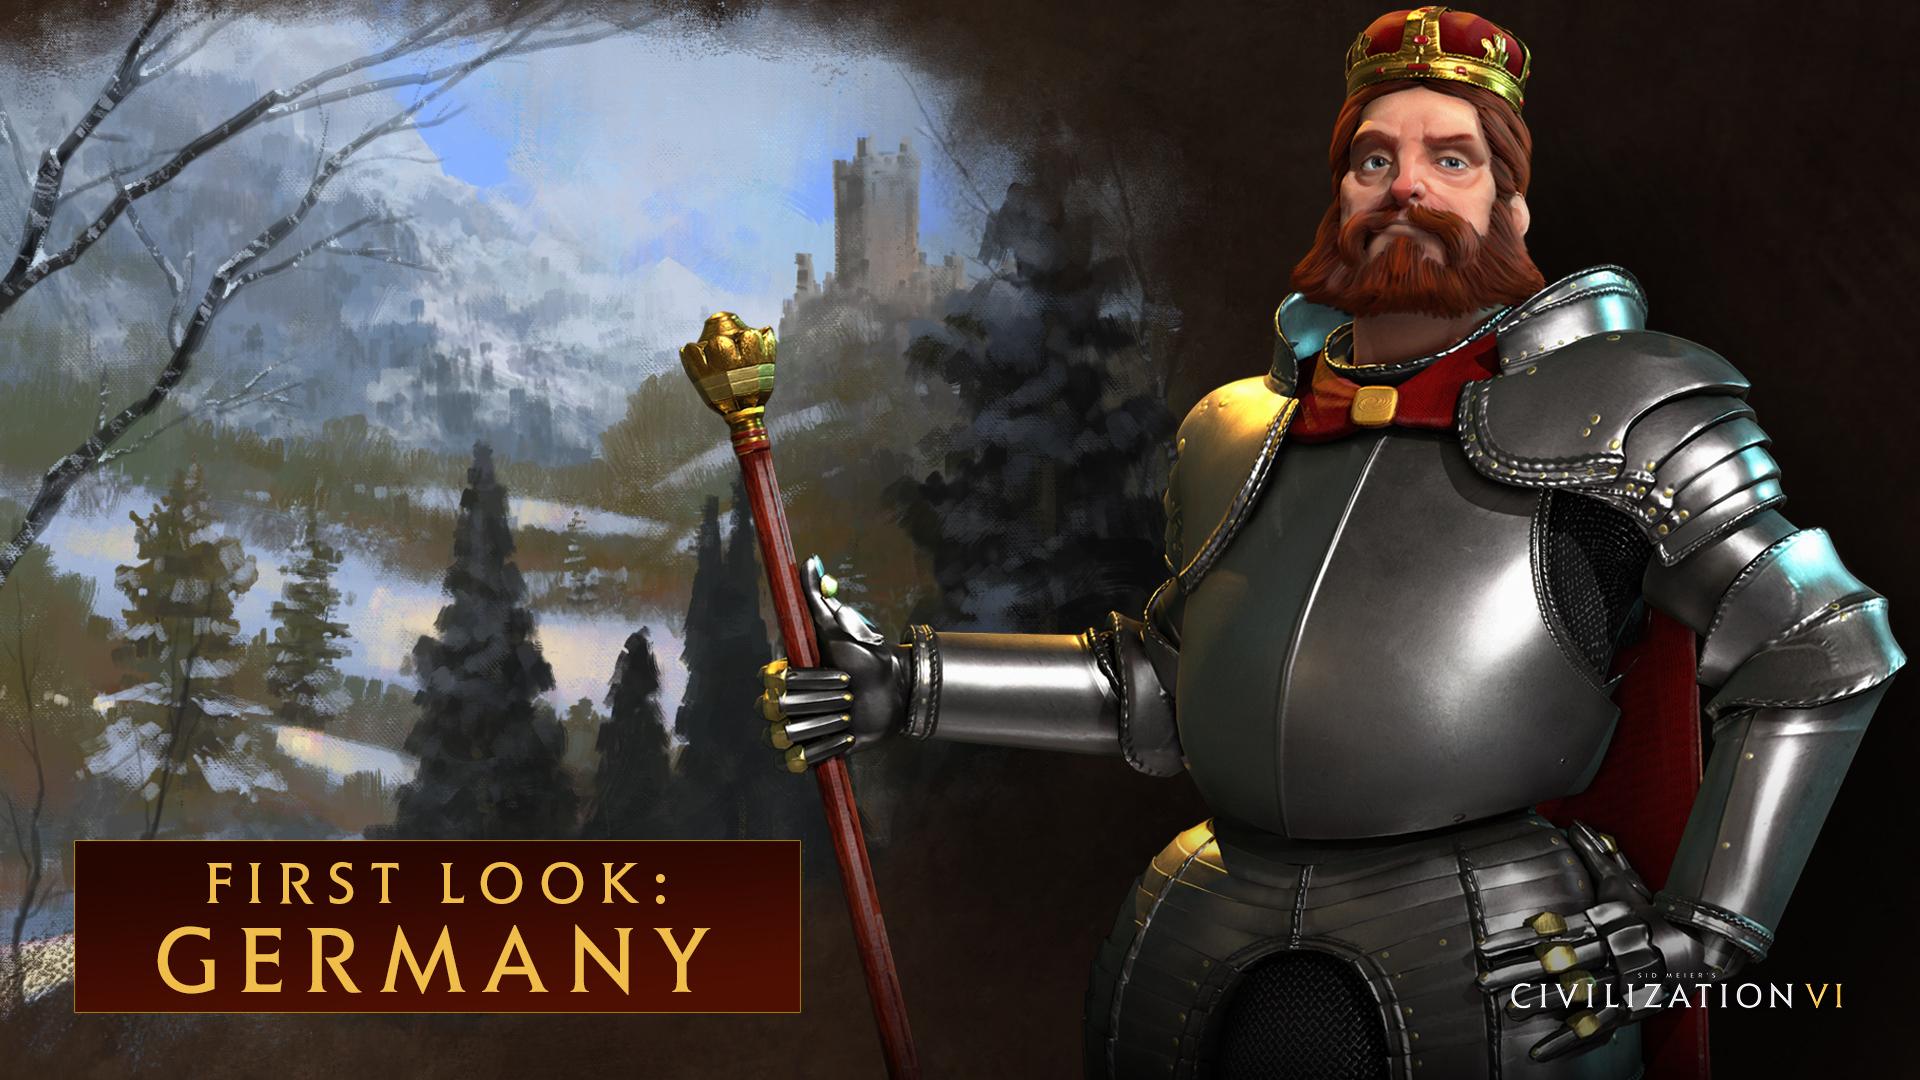 Frederick Barbarossa and a Civ 6 Easter Egg